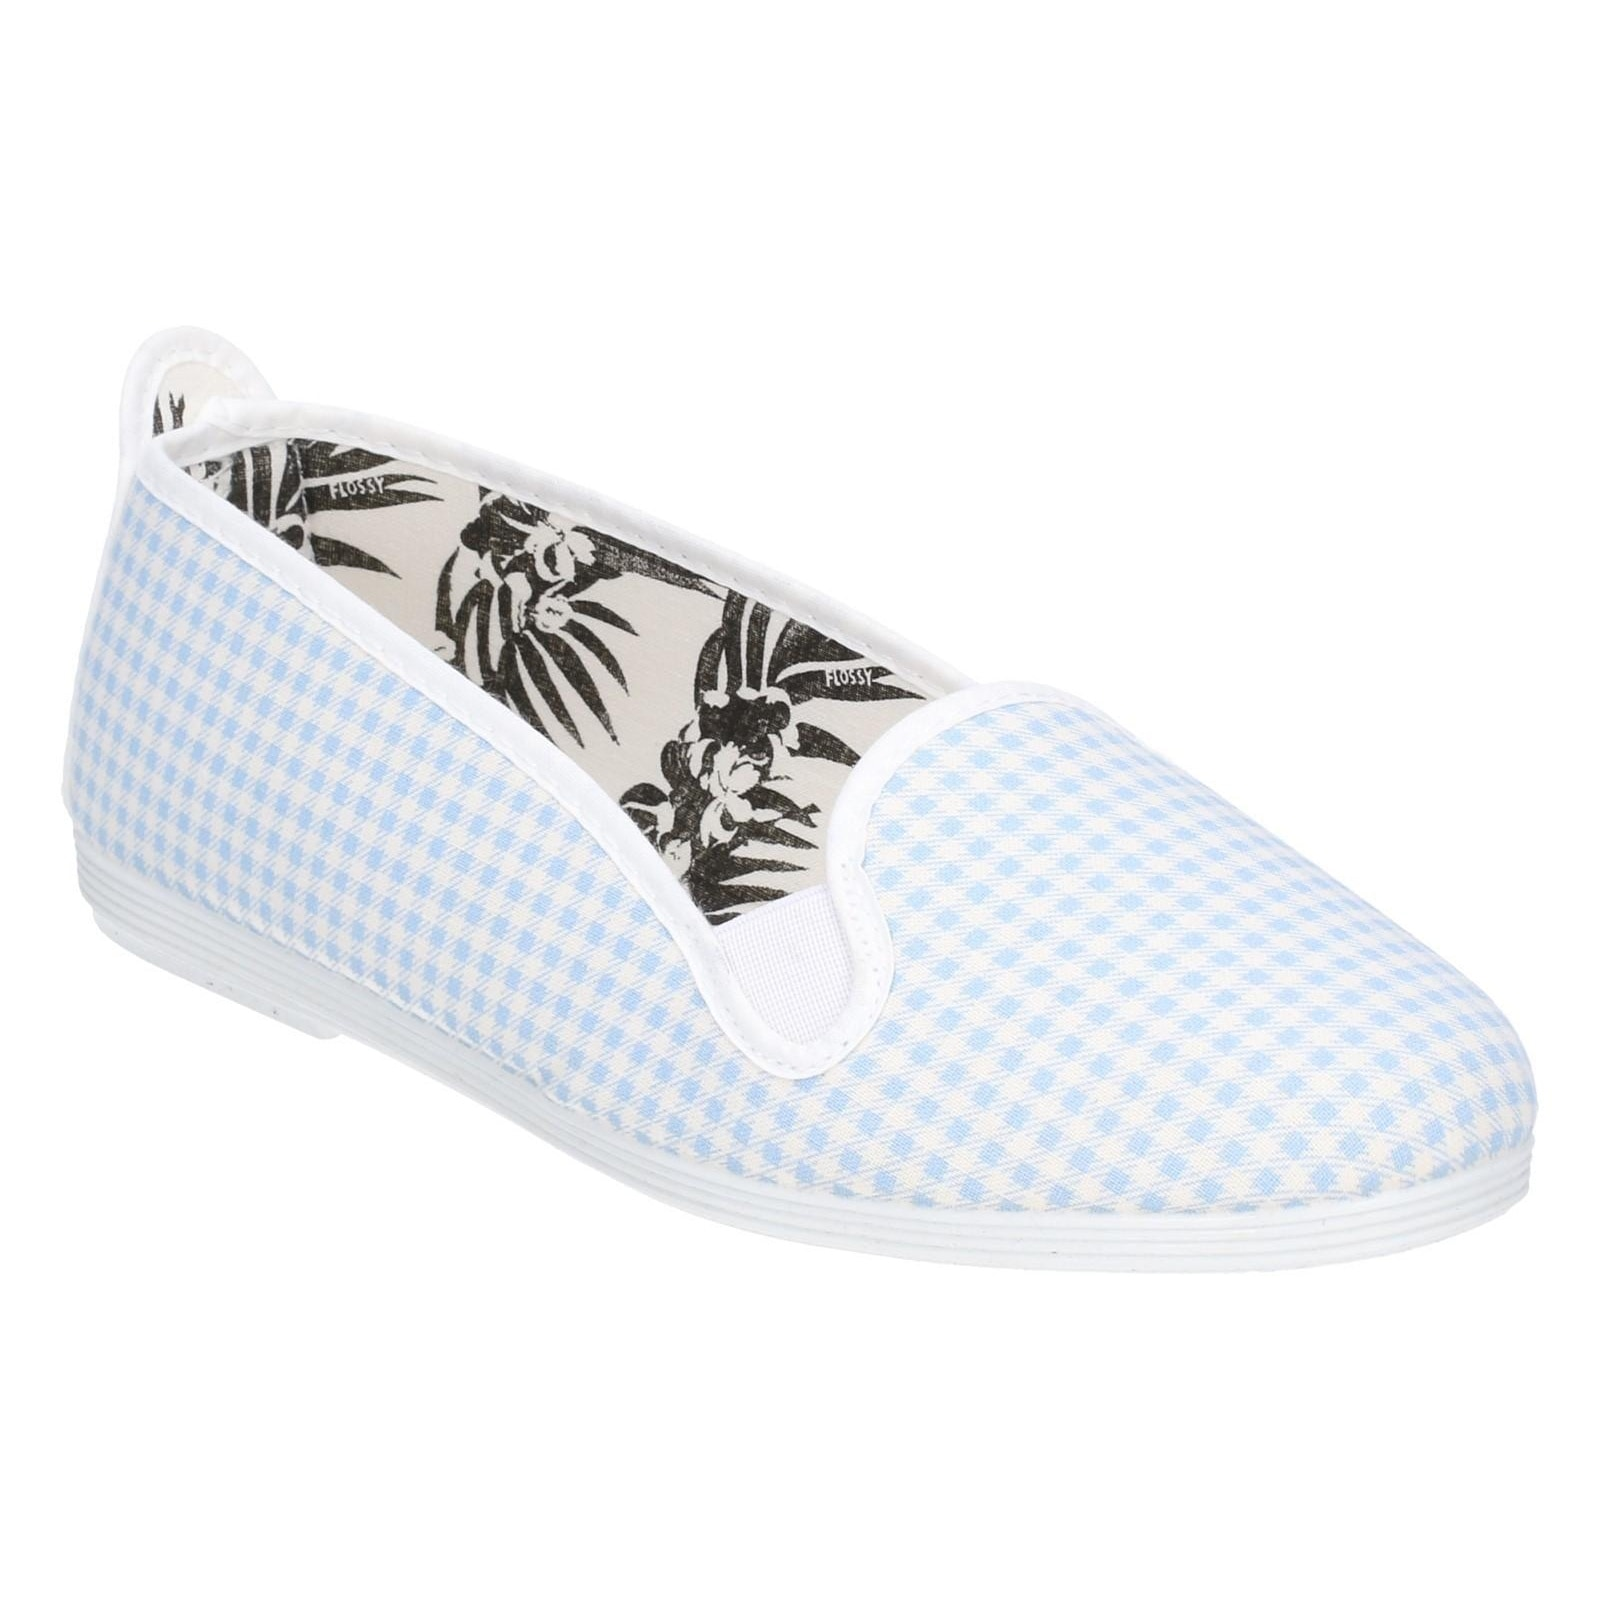 flossy -  Slipper Damen Comodon Slip On Schuh